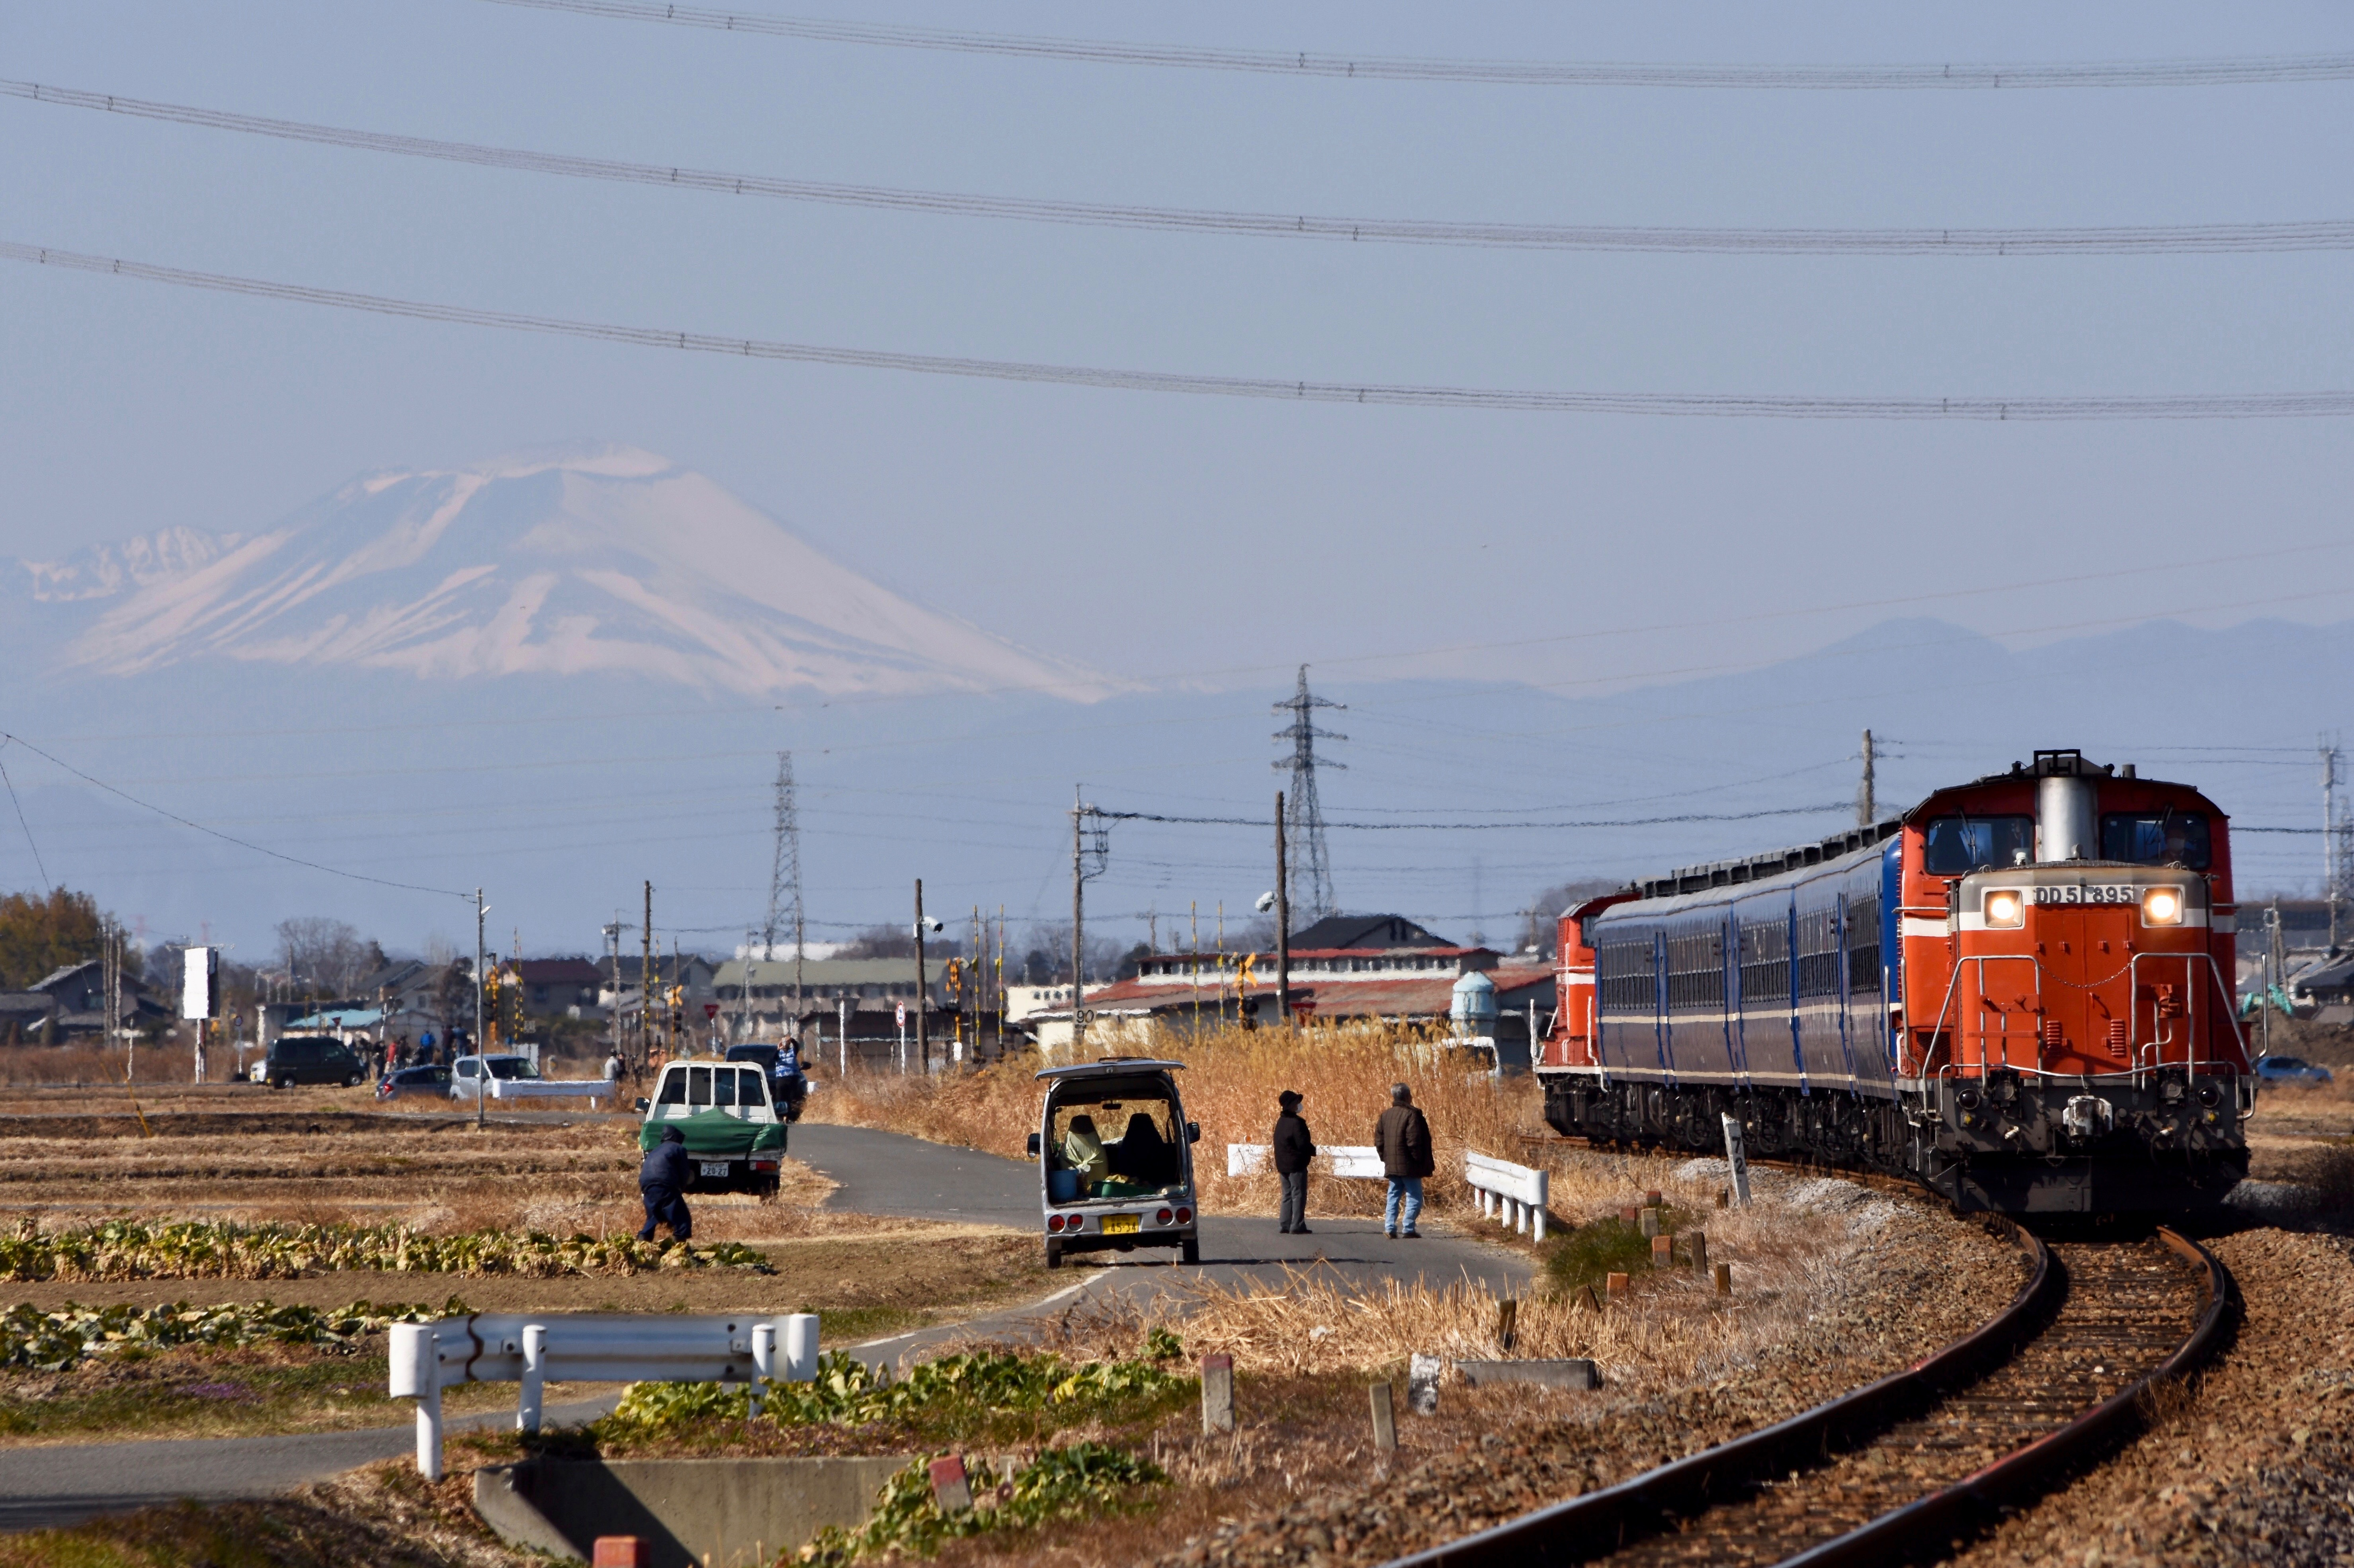 f:id:Nagaoka103:20190218013001j:image